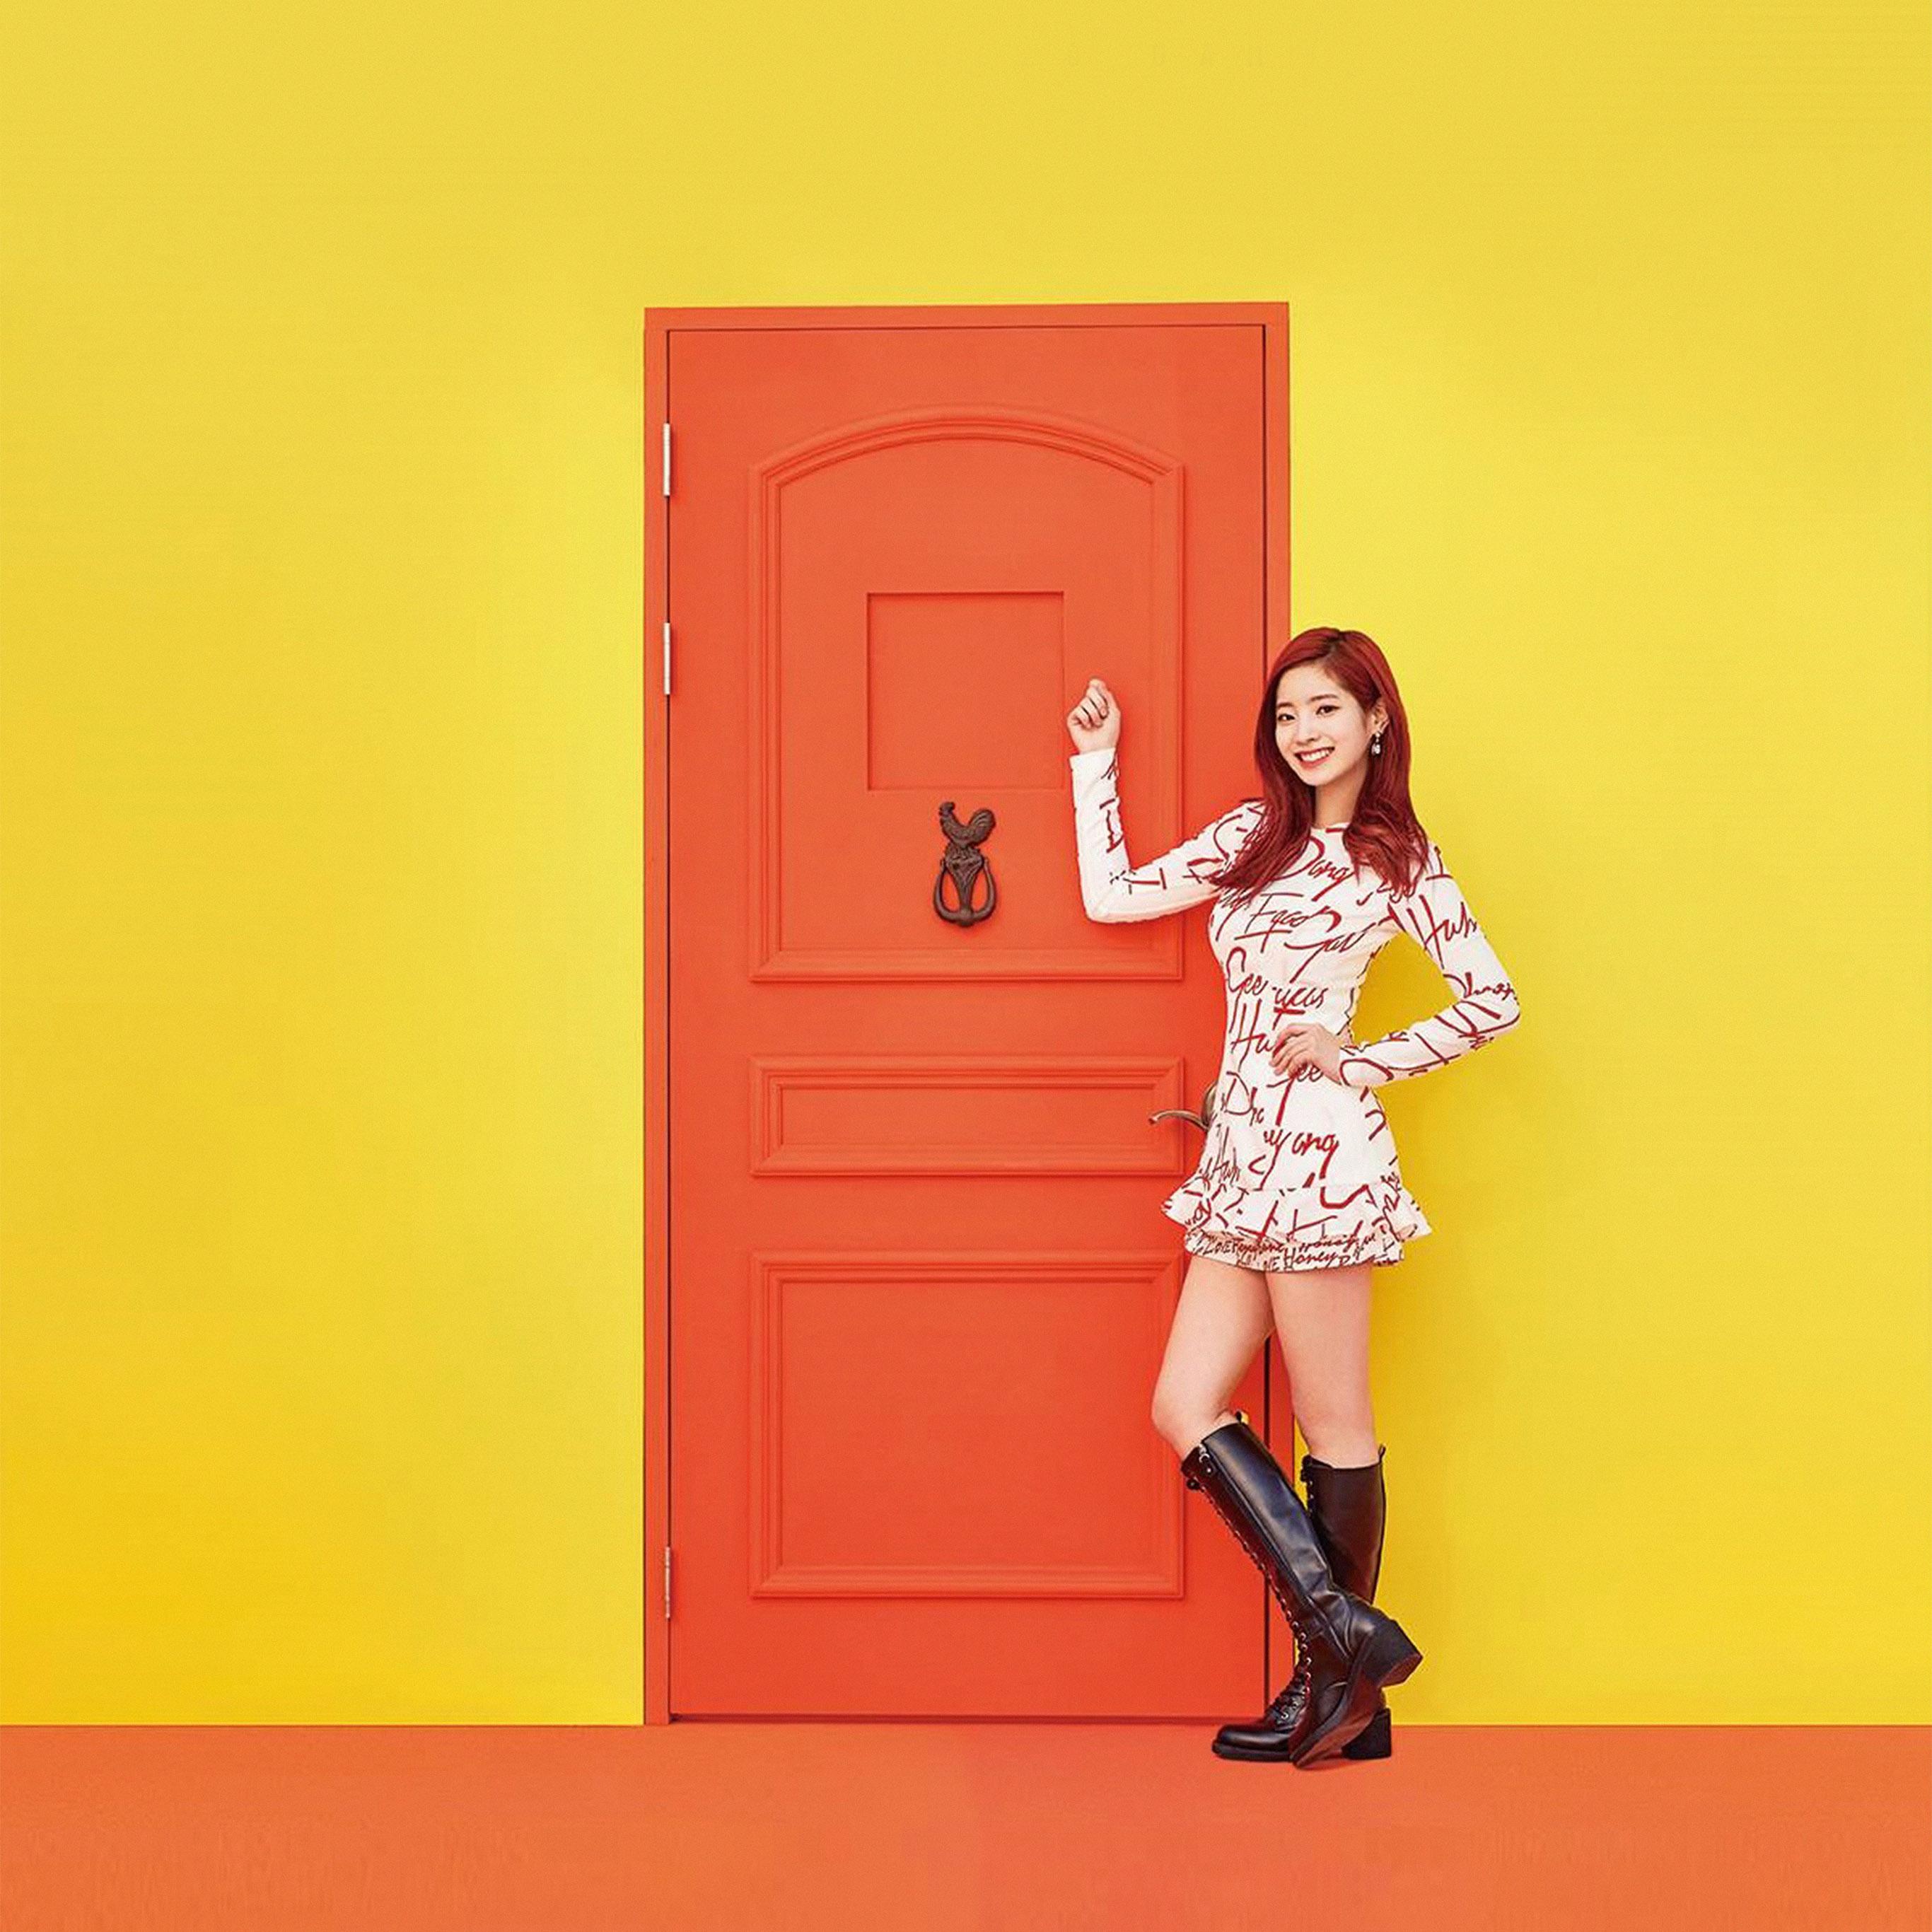 Hm35-yellow-girl-kpop